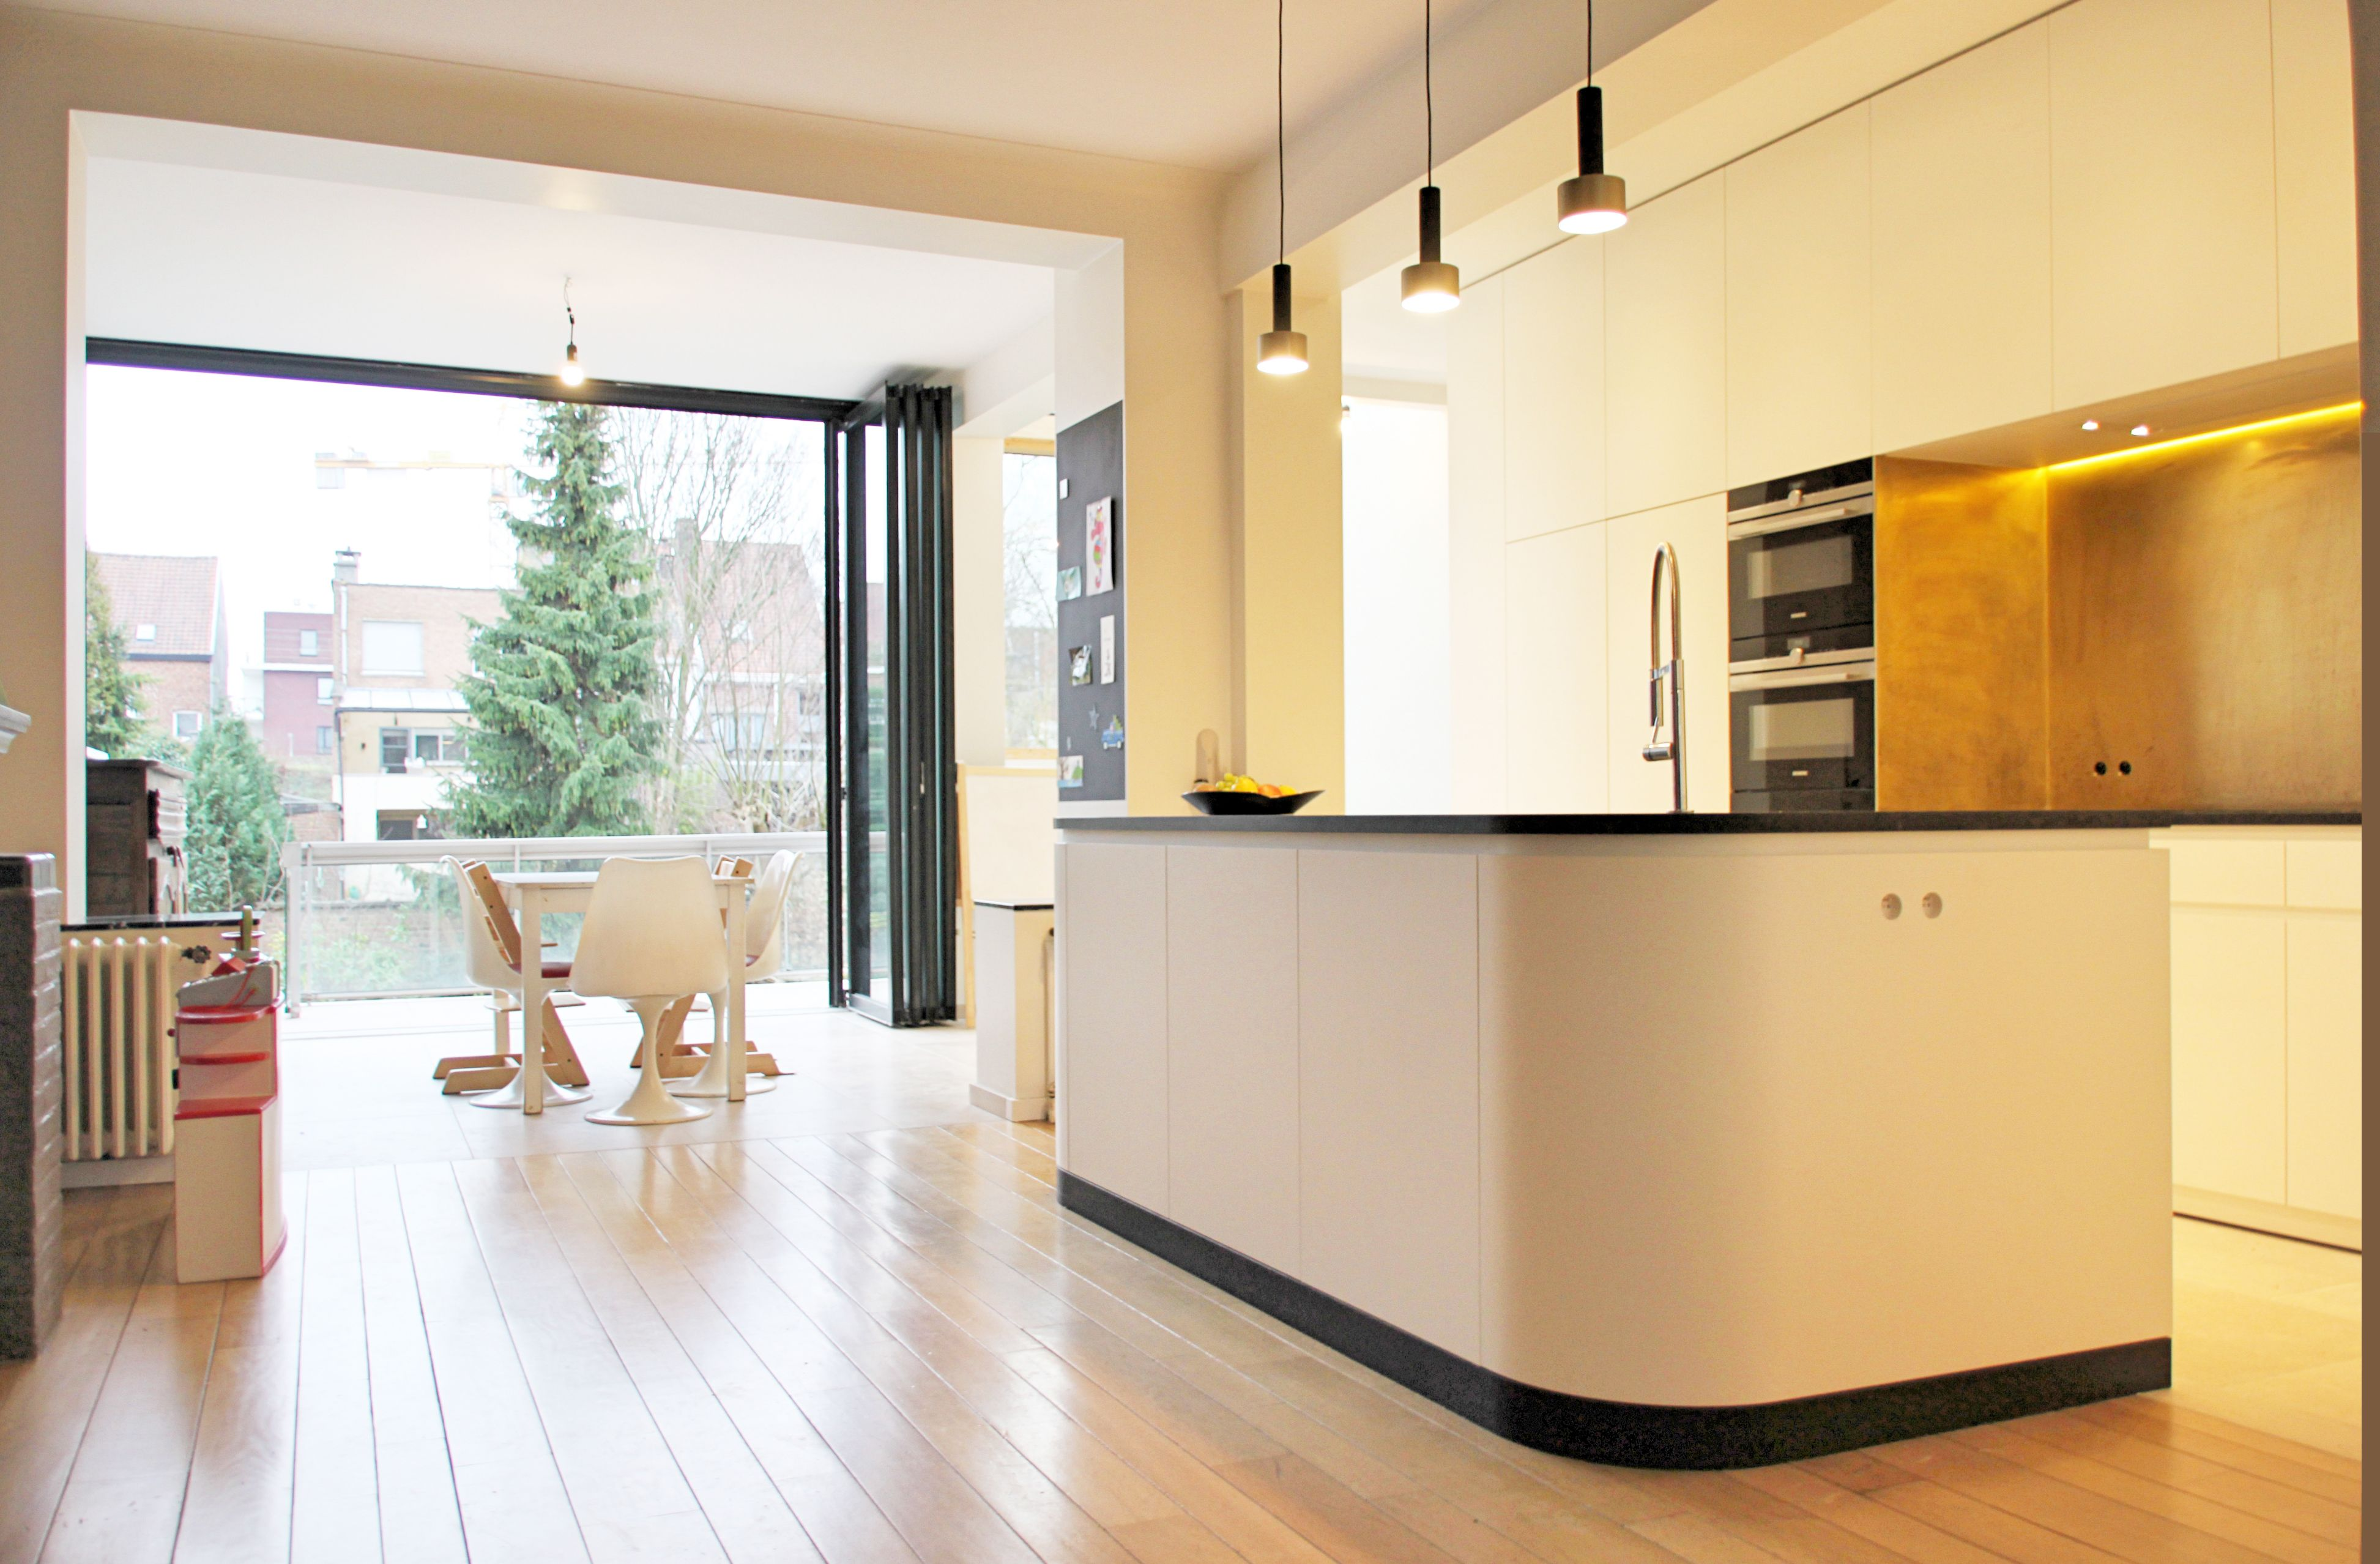 Interieur open keuken renovatie messing eik parket siemens